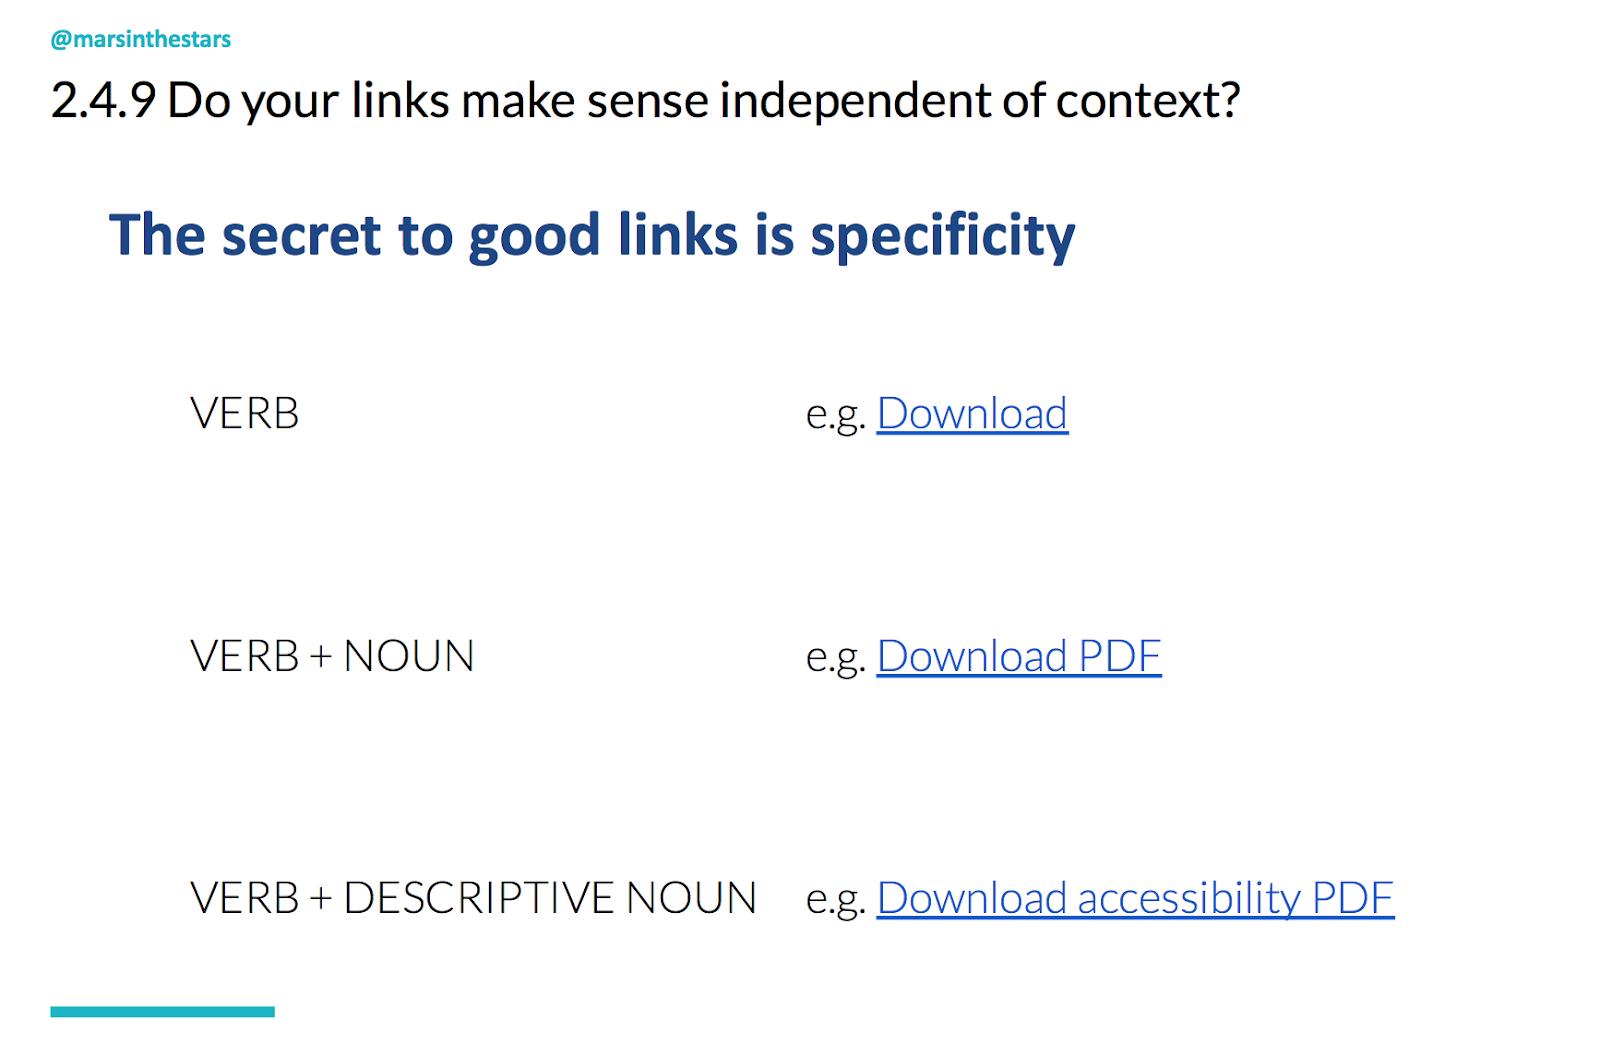 Slide shows the secret to good links is specificity. This means a verb + descriptive noun e.g. Download accessibility PDF